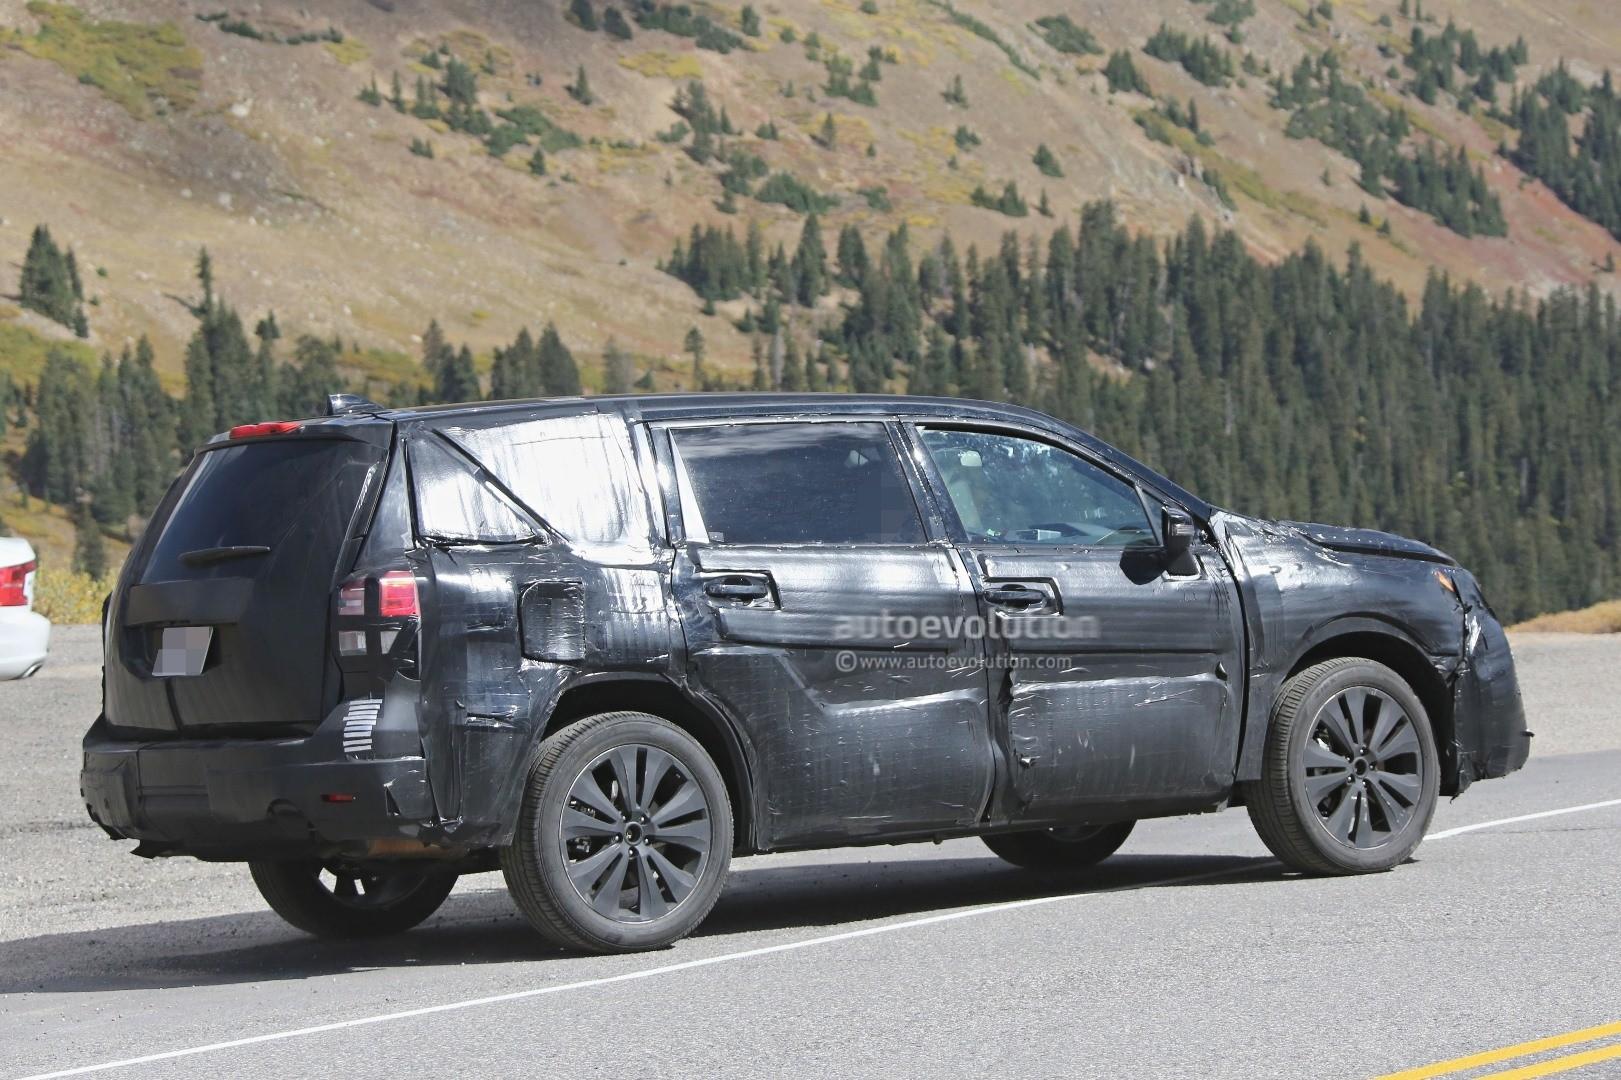 2019 Subaru Tribeca Heir Spied Benchmarking Against Mazda ...